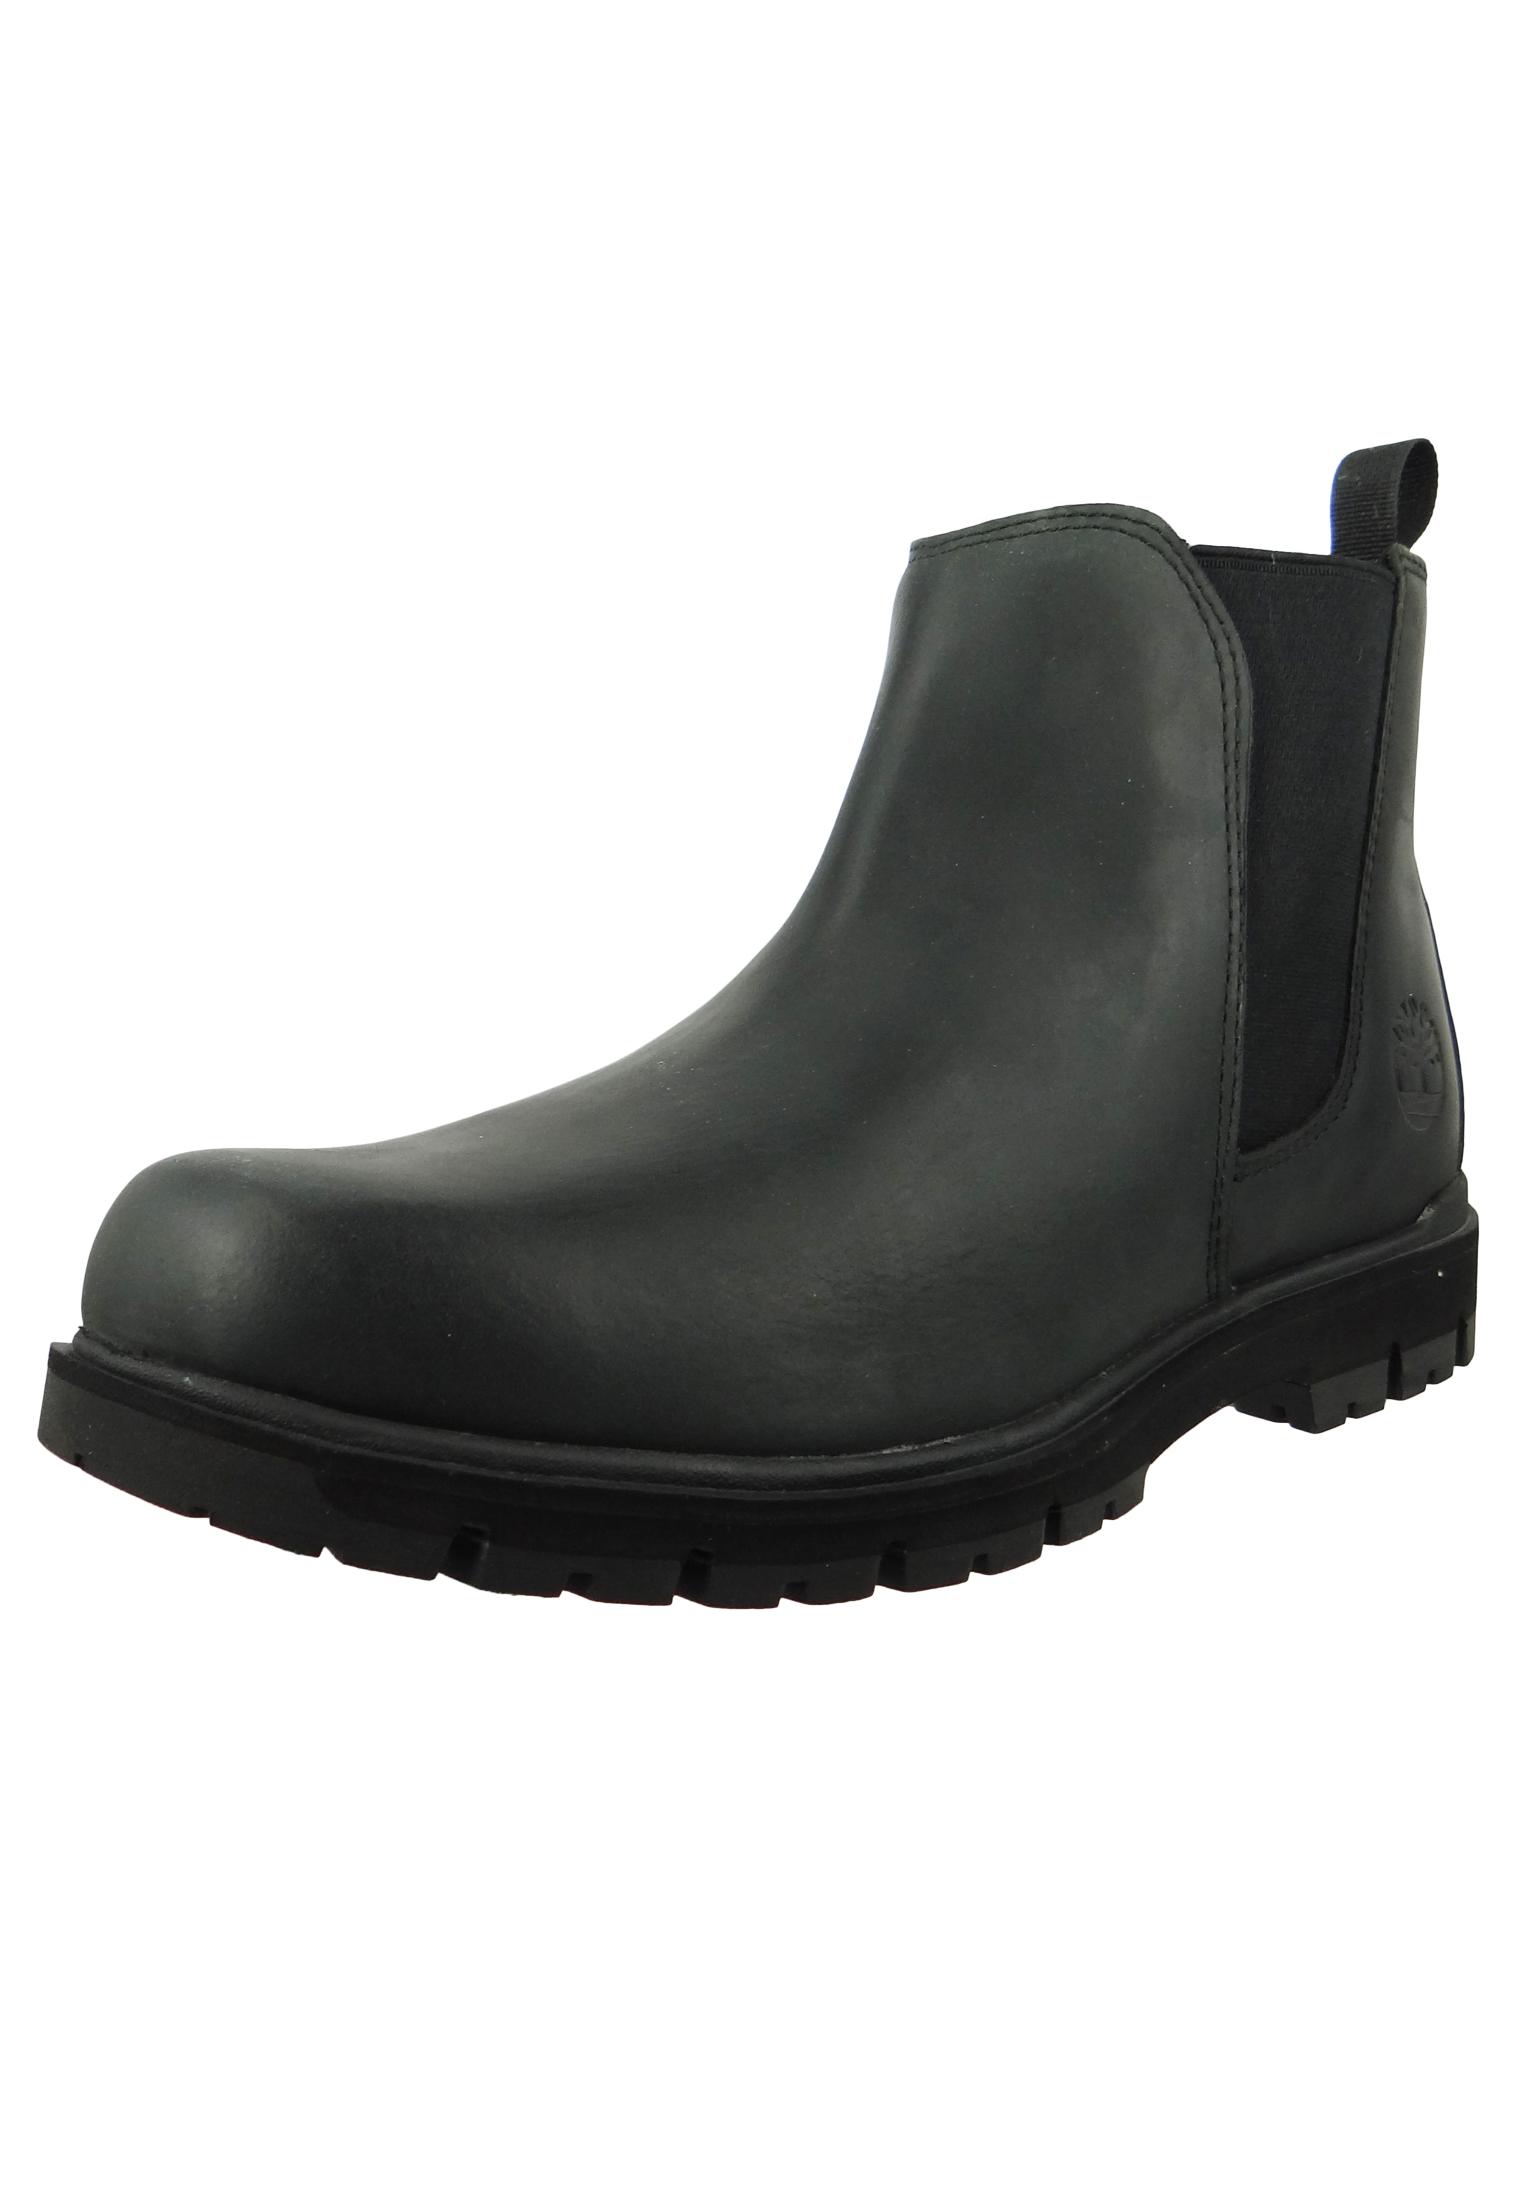 promo code dd381 21bf0 Timberland Herren Stiefelette Radford Chelsea Chukka Boots Schwarz Leder  Potting Black A1UQ6